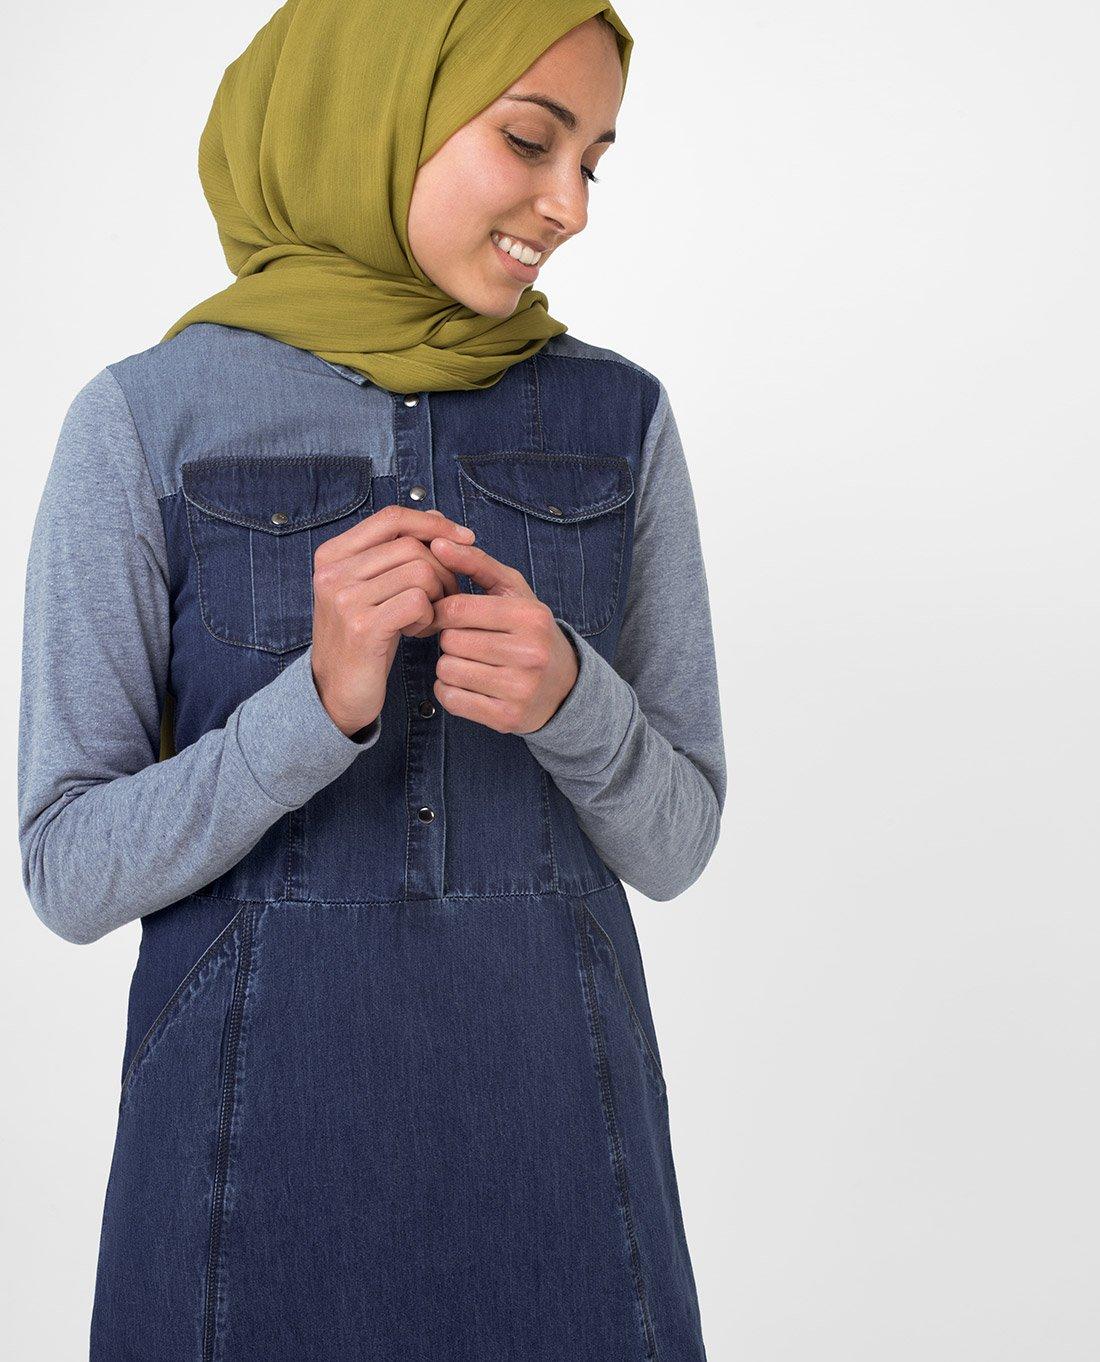 Silk Route Grey Contrast Fine Denim Maxi Dress Jilbab Medium 56 by Silk Route (Image #3)